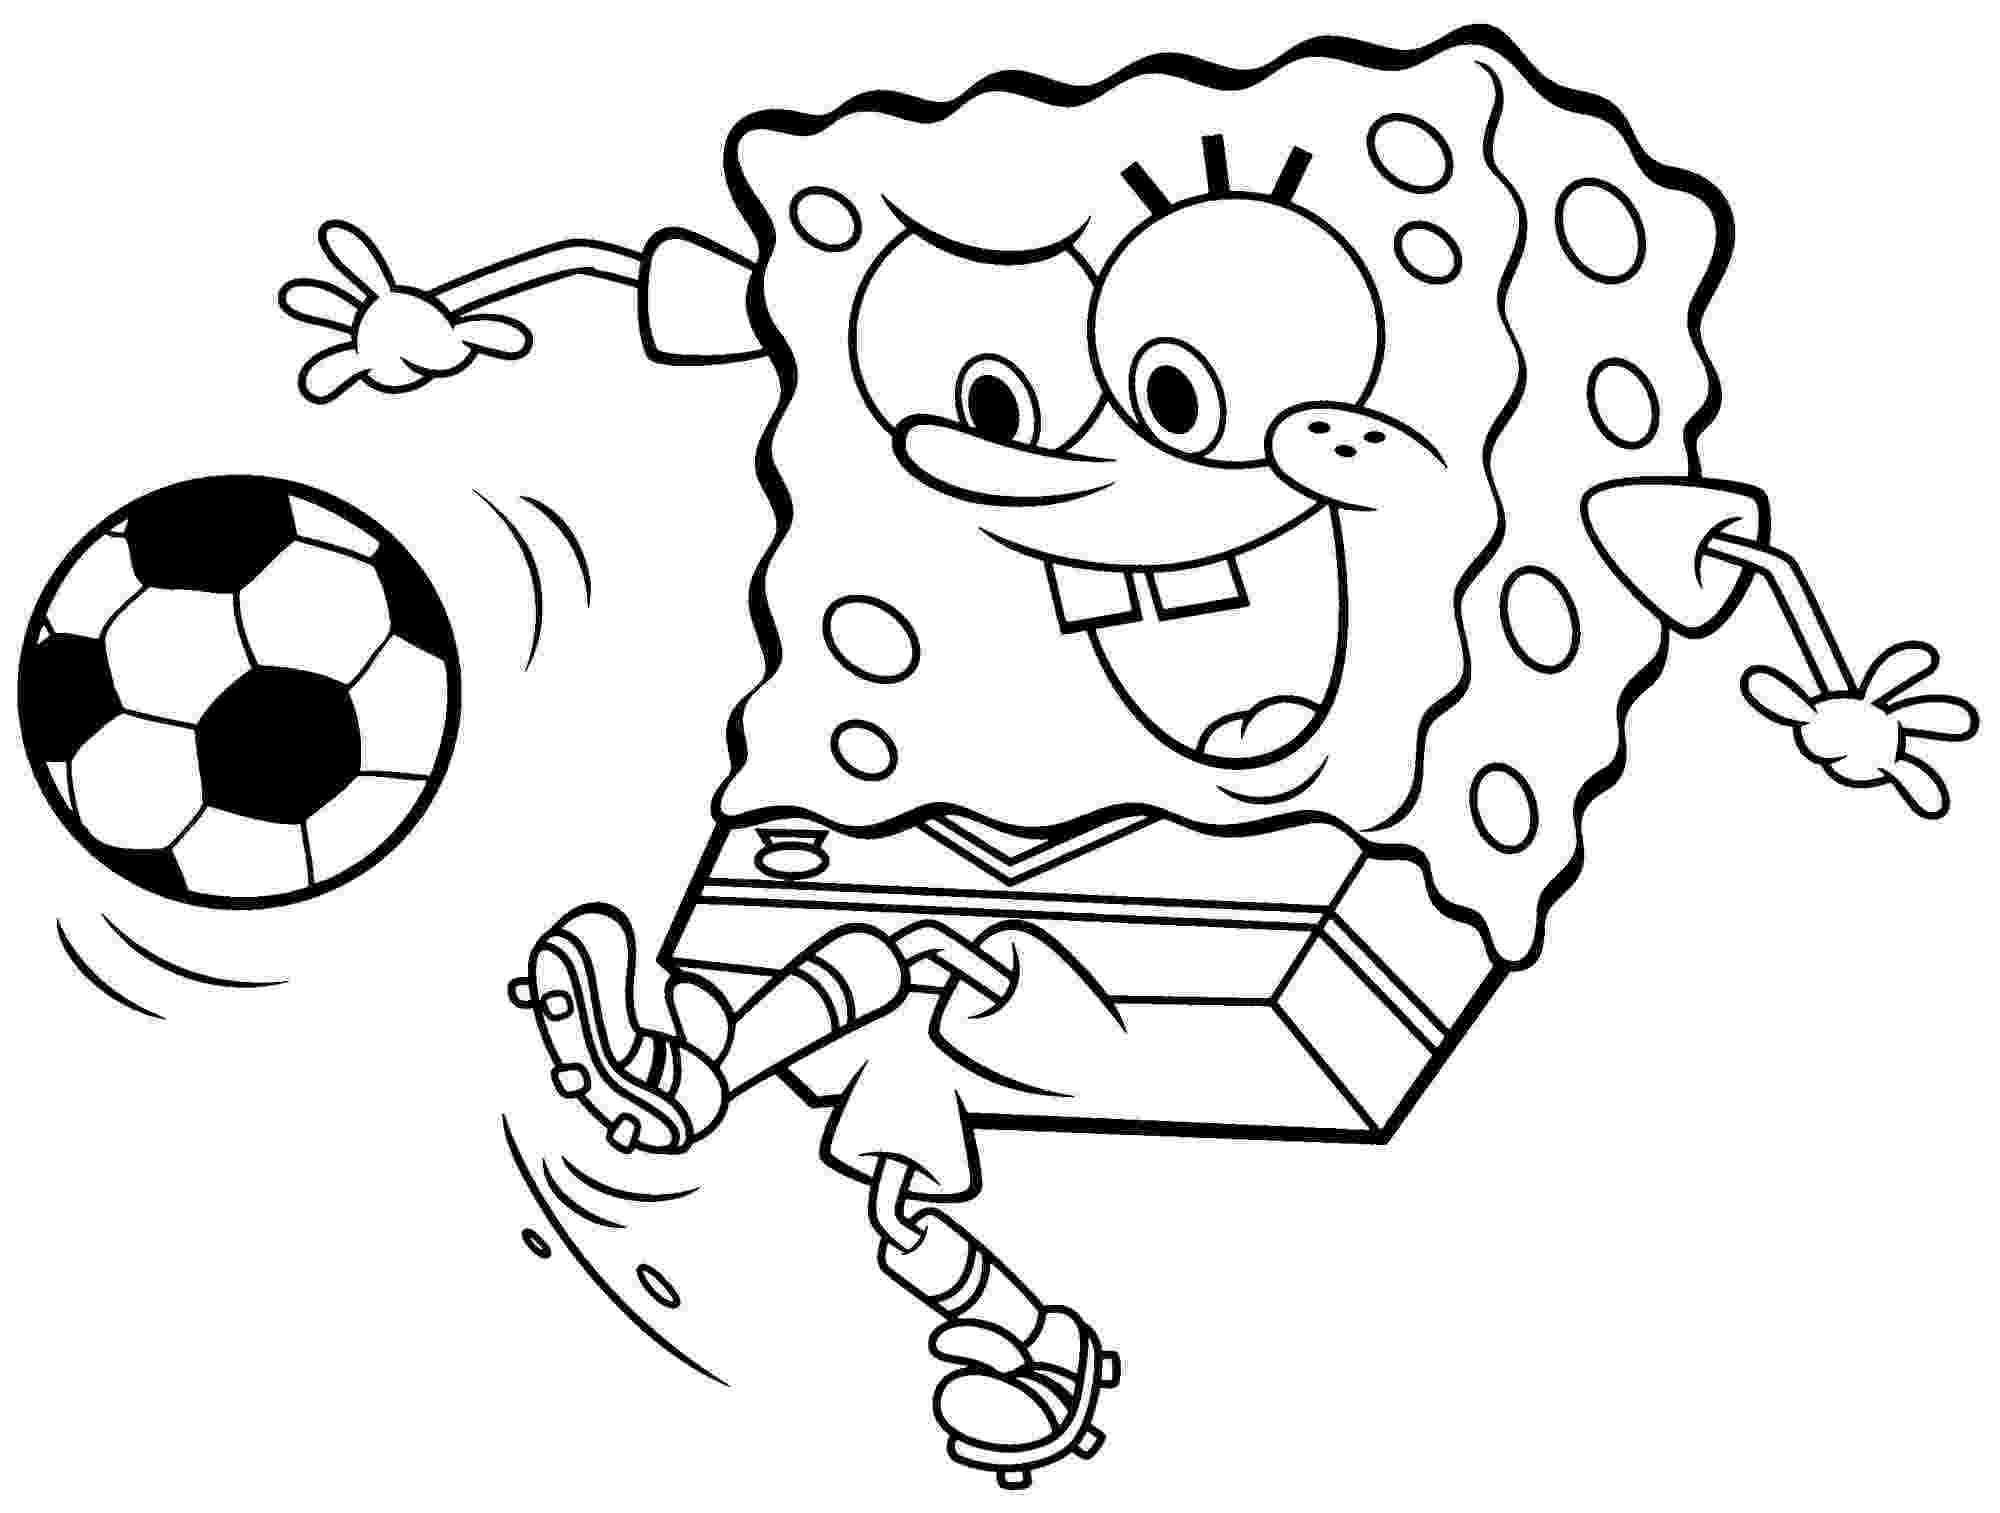 coloring spongebob printable spongebob coloring pages for kids cool2bkids coloring spongebob 1 1